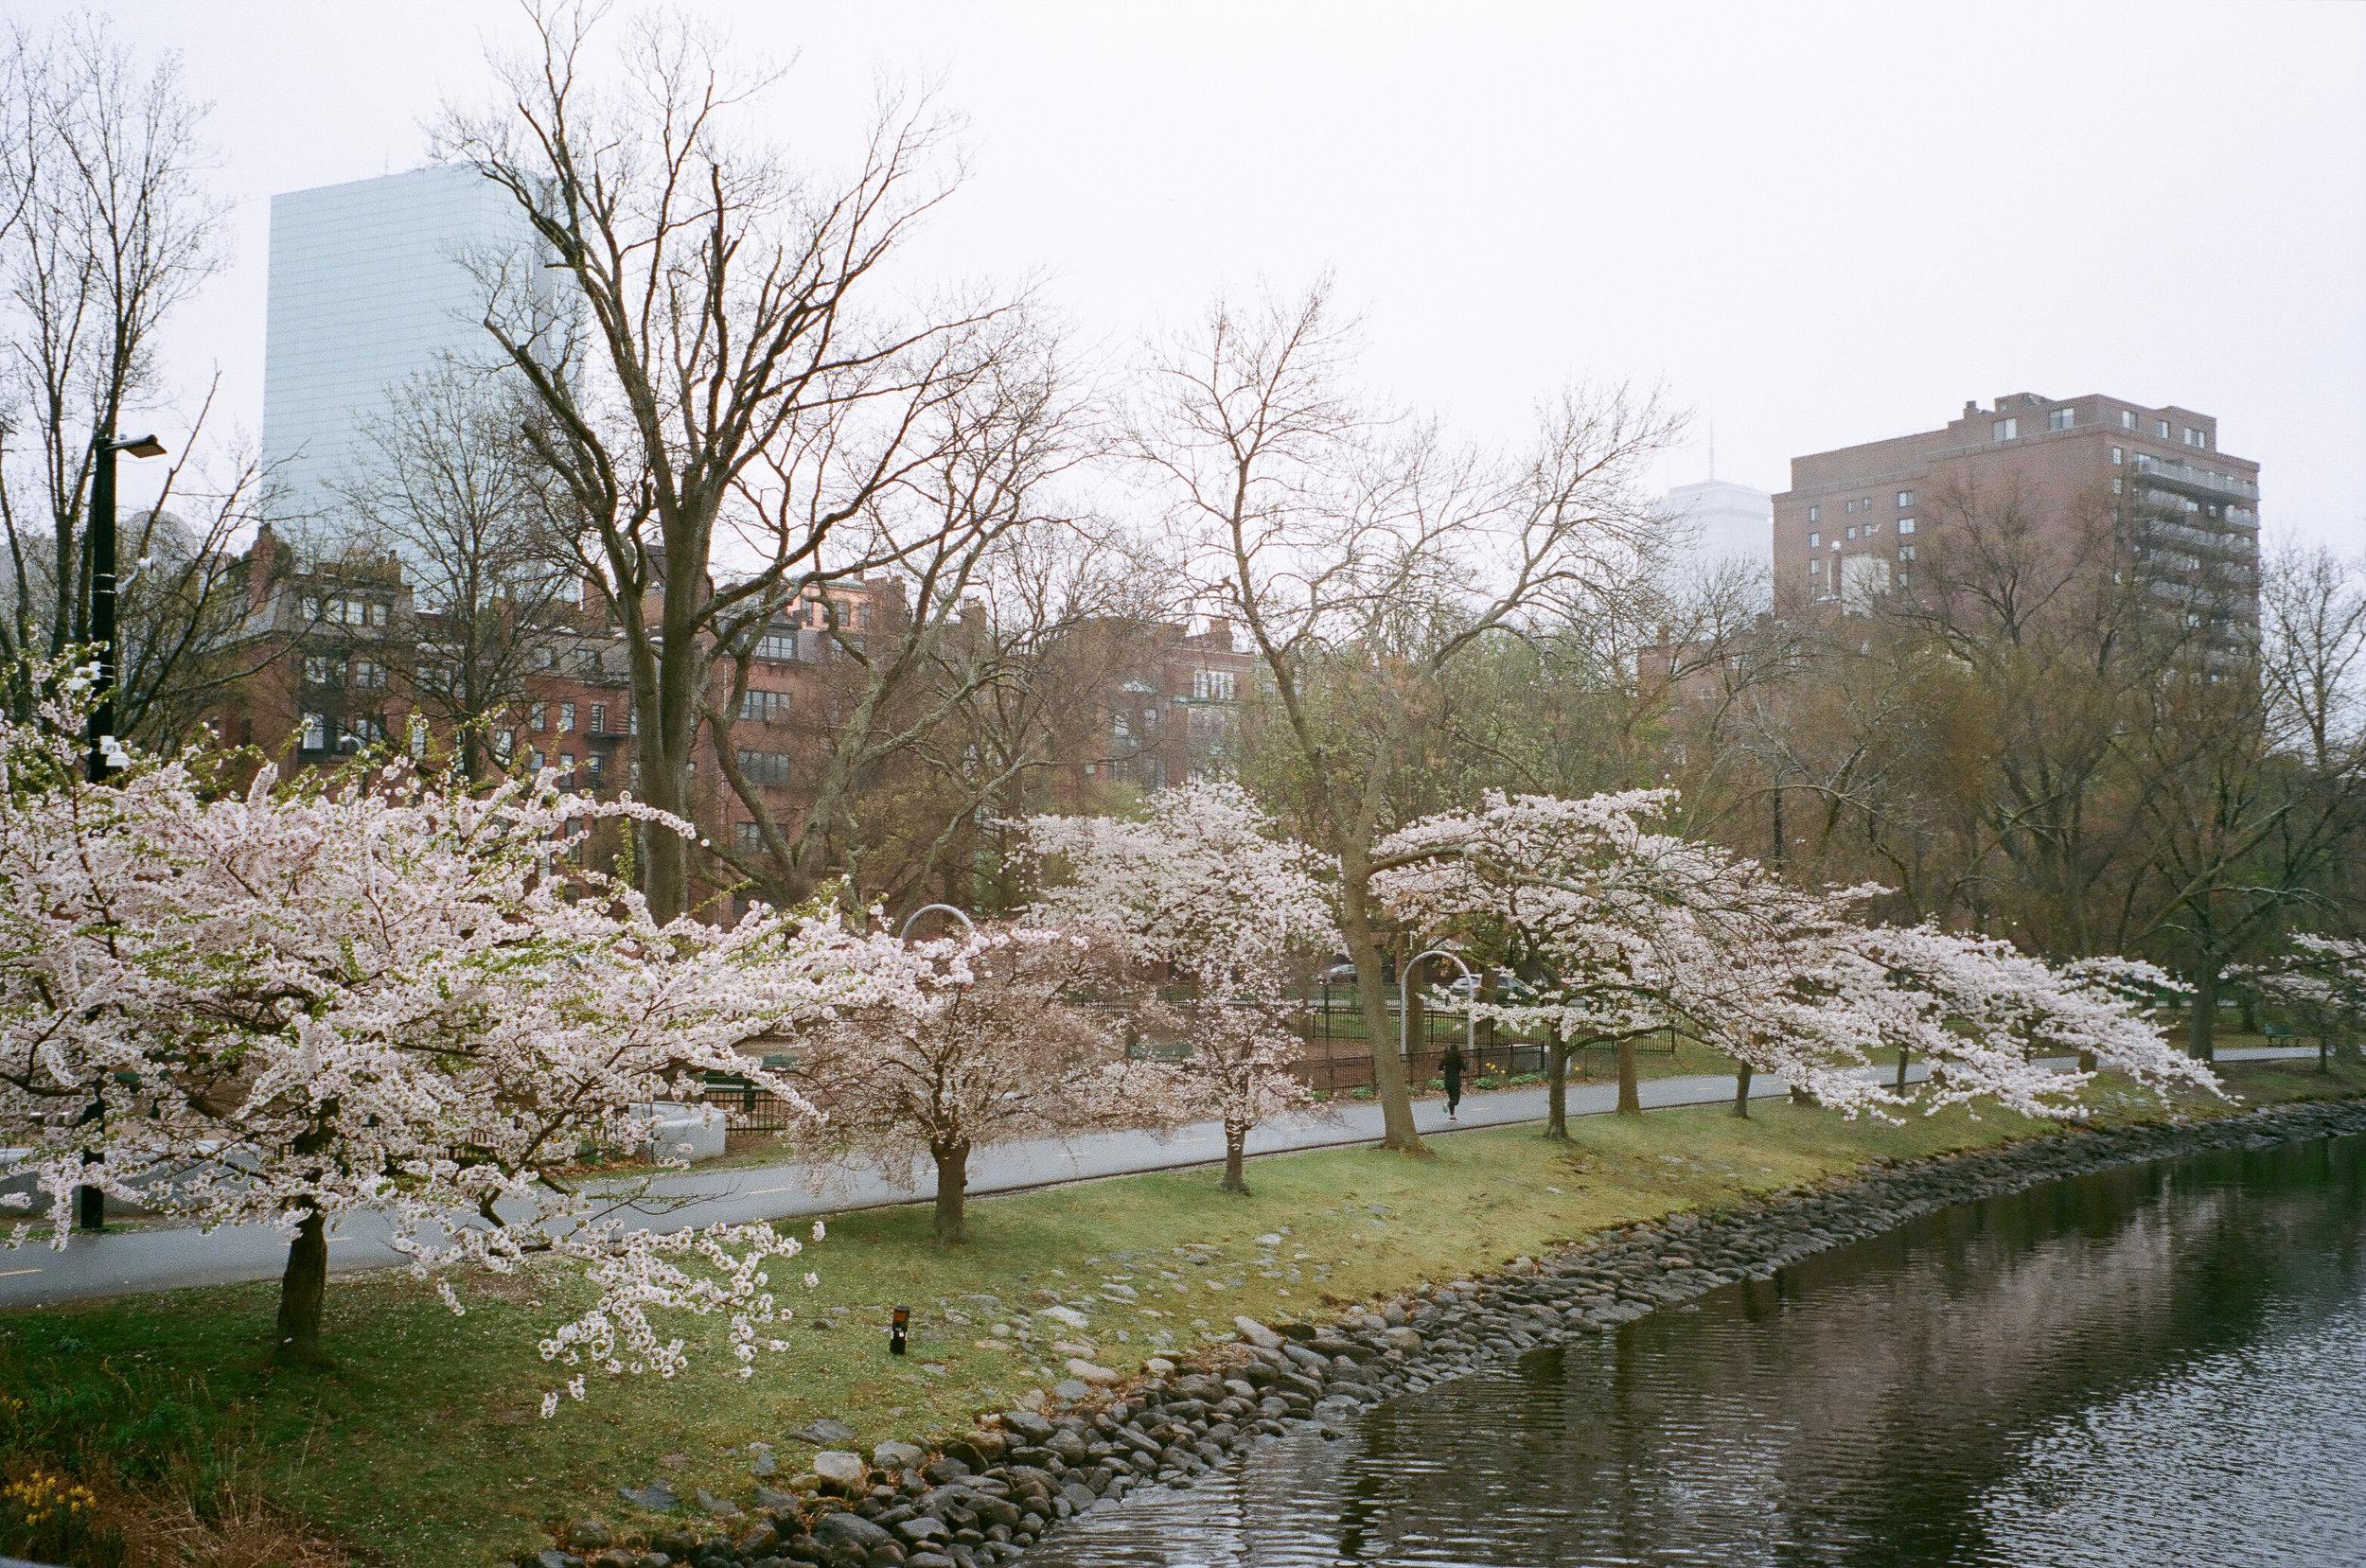 LeicaM6042019-1225.jpg